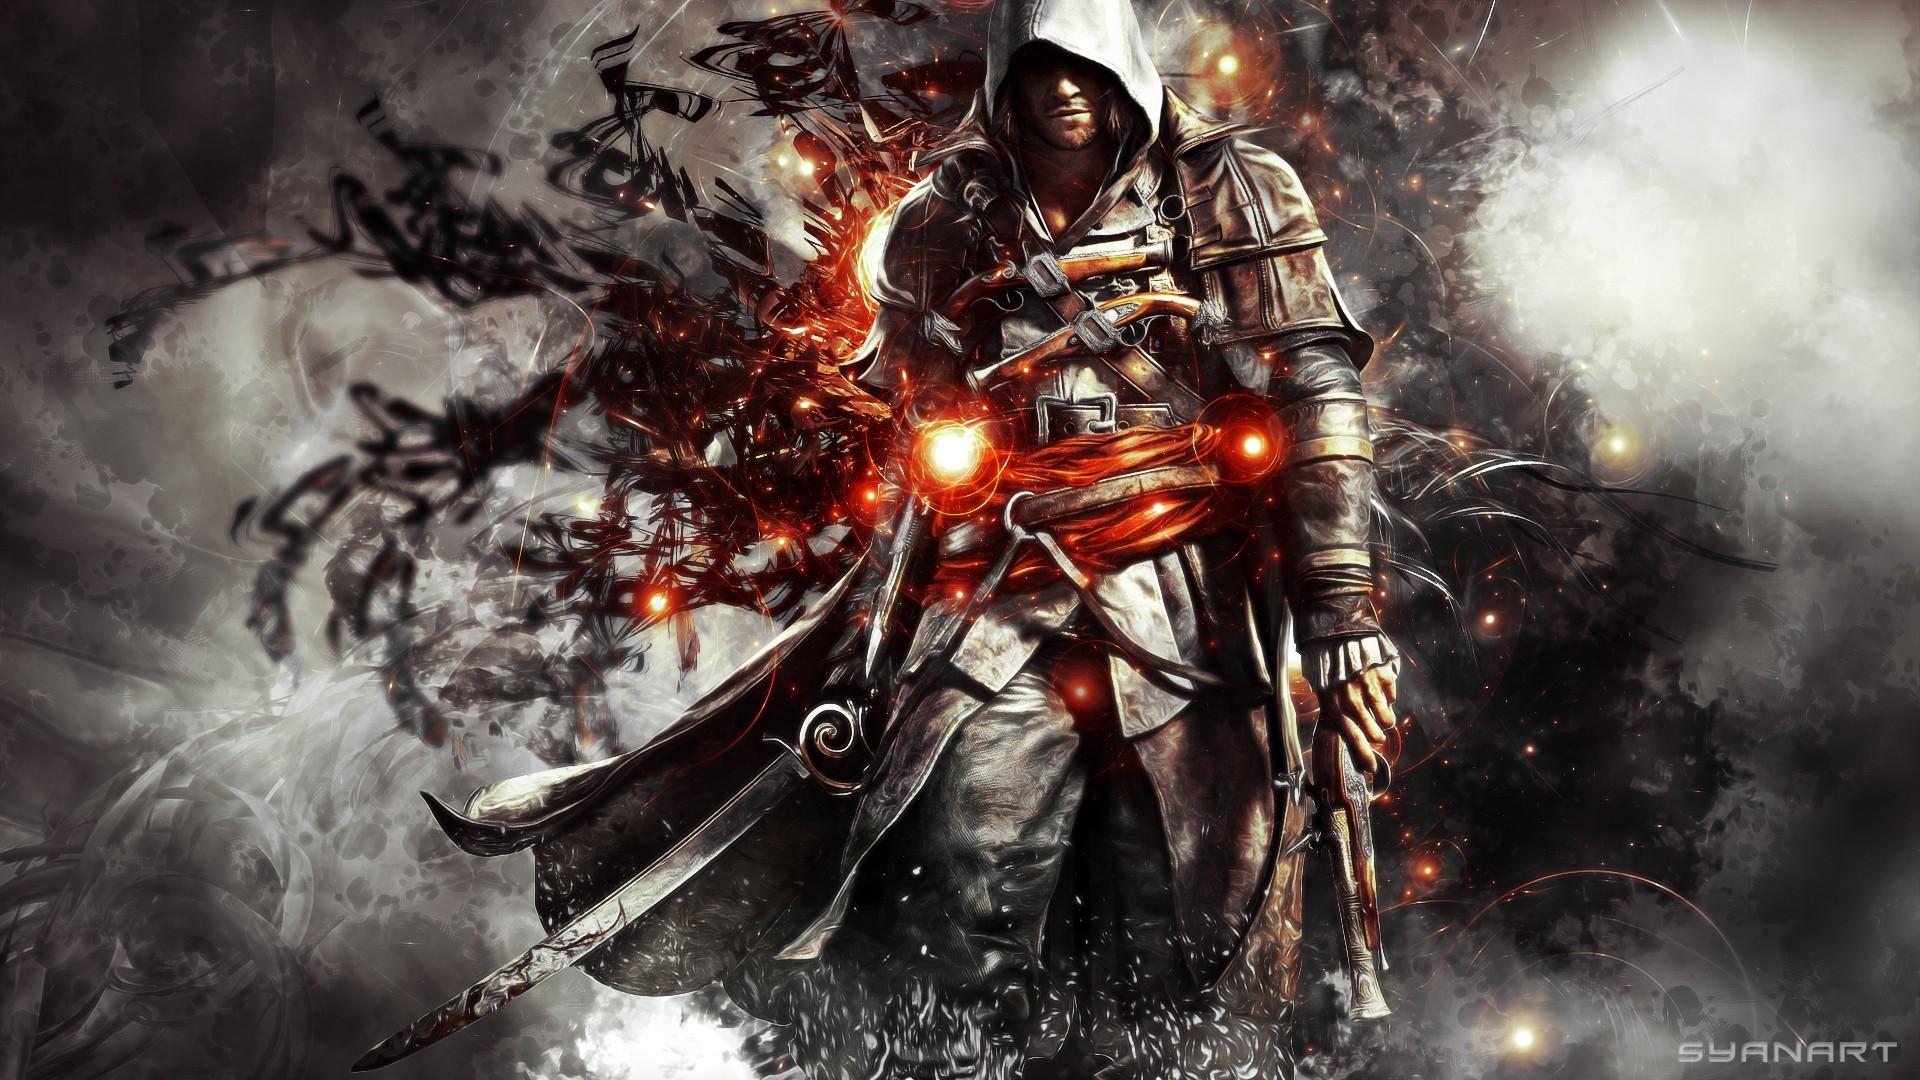 Assassins Creed Wallpapers Hd Wallpaper 1920x1080